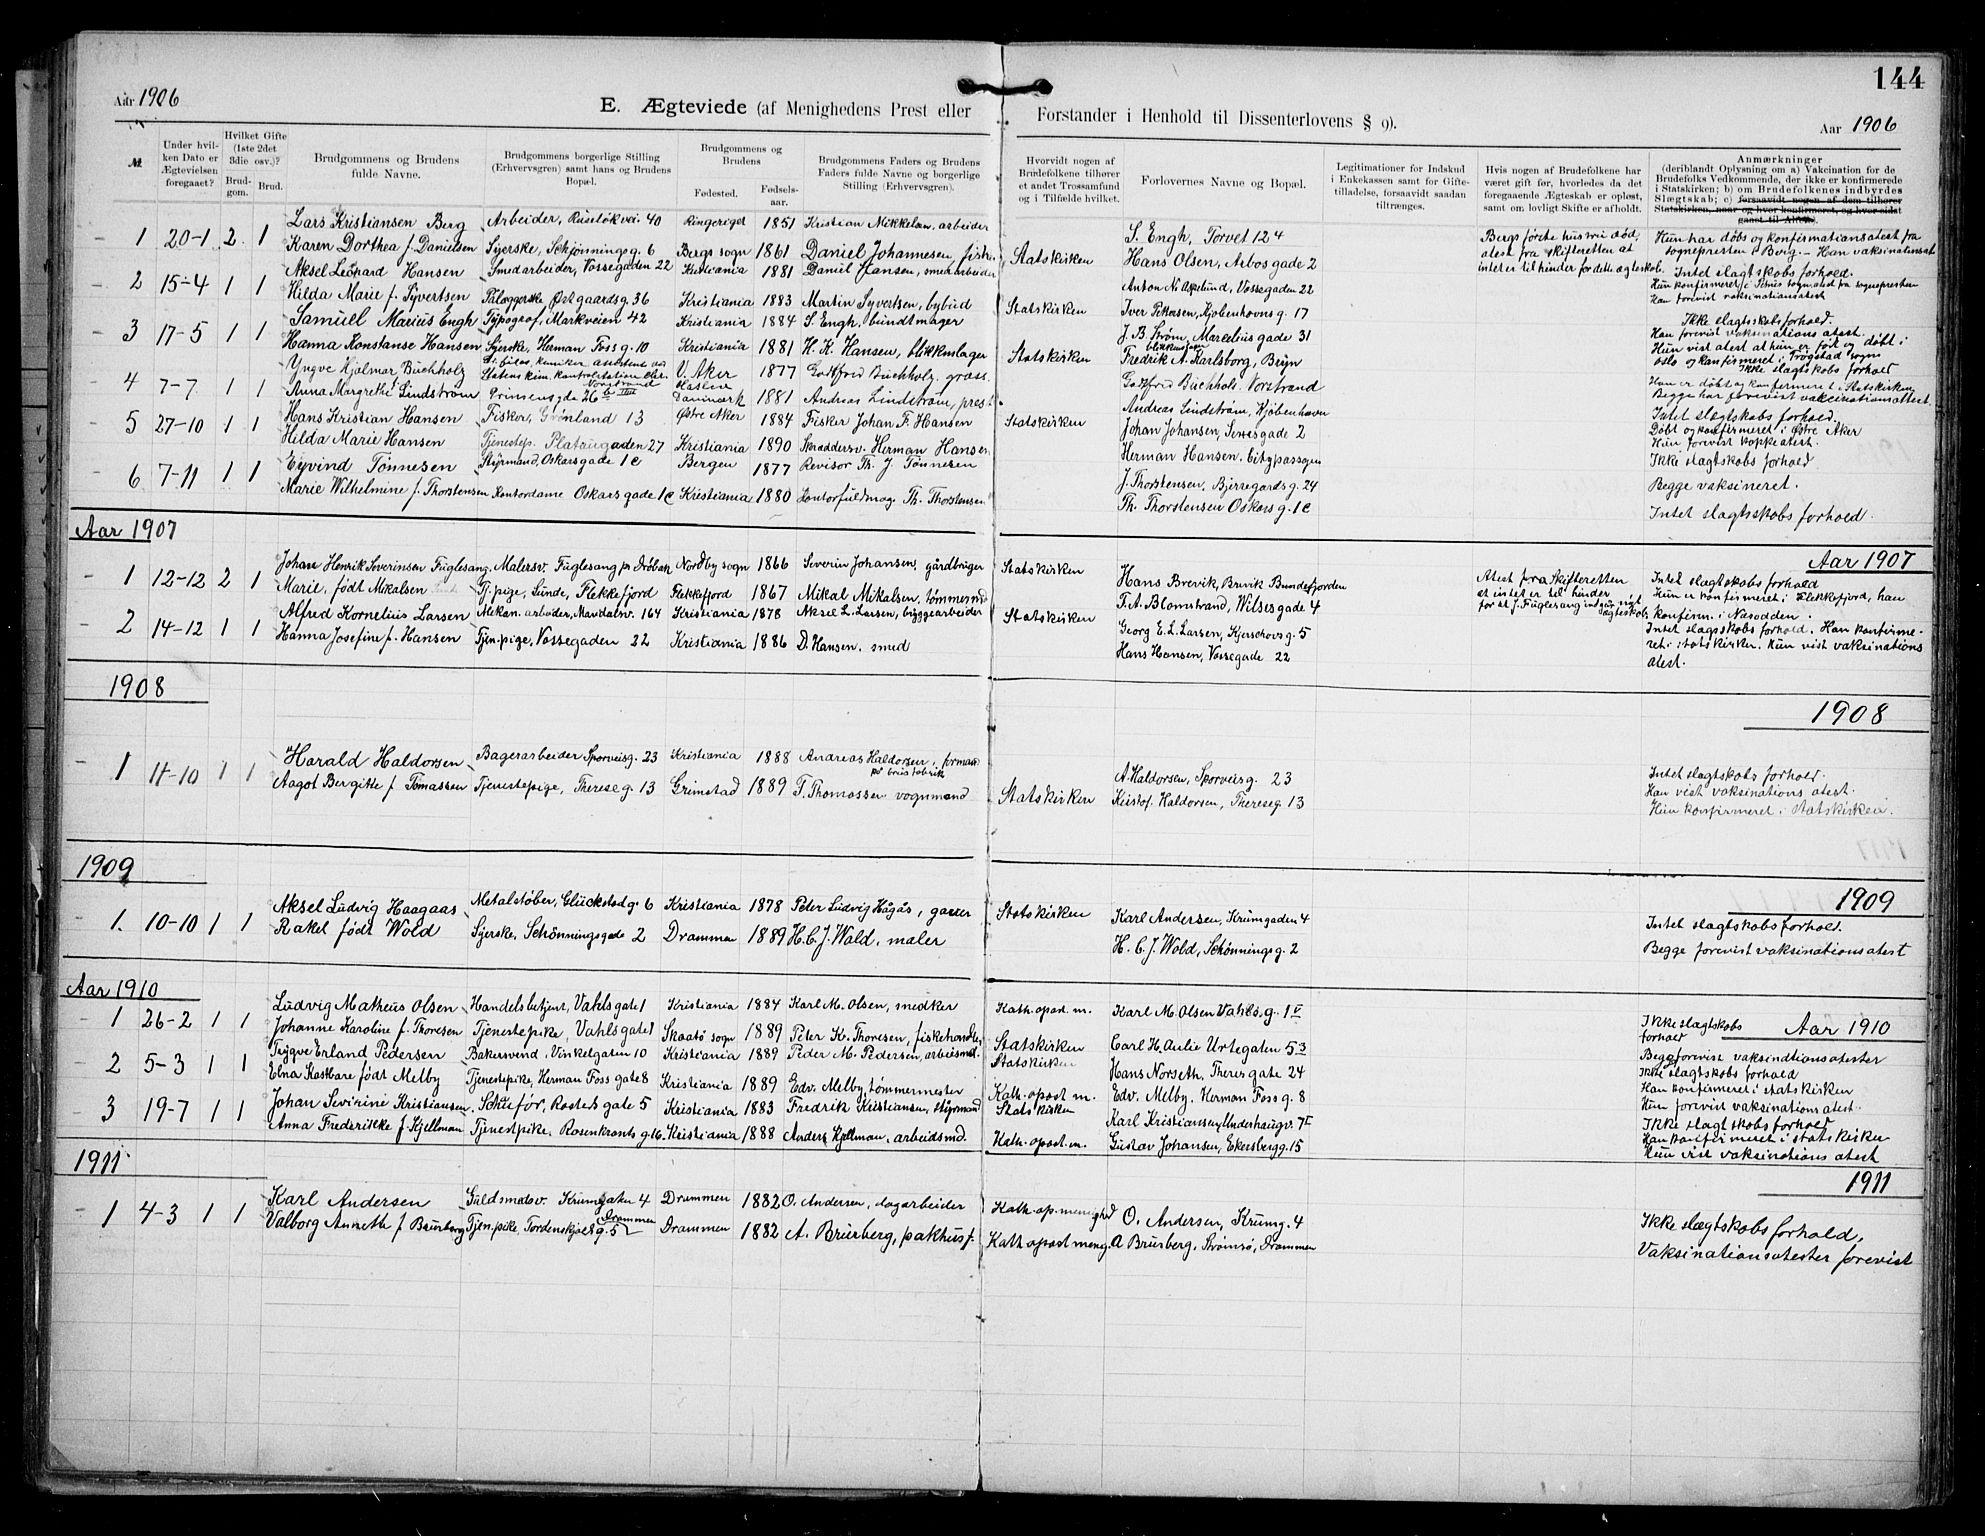 SAO, Den katolsk apostoliske menighet i Oslo , F/Fa/L0002: Dissenterprotokoll nr. 2, 1892-1937, s. 144